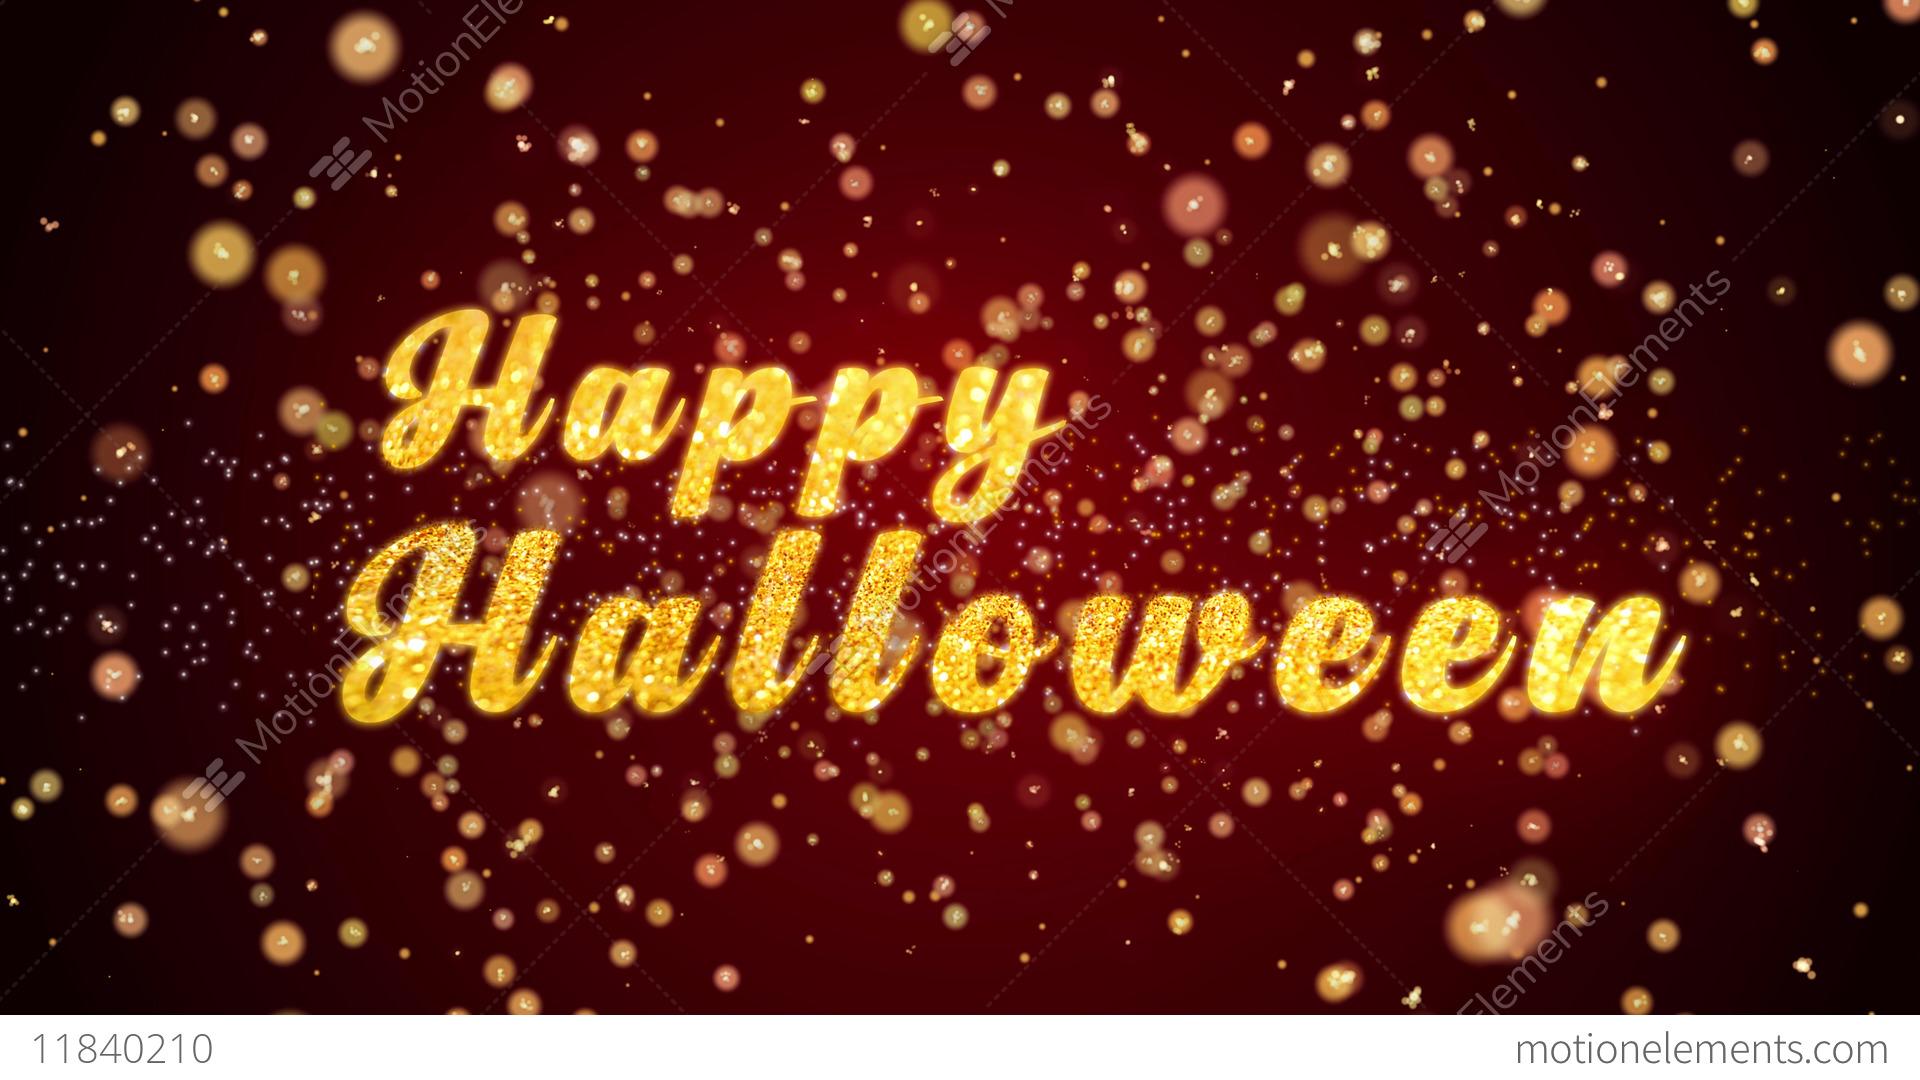 Happy halloween greeting card text shining particles for stock happy halloween greeting card text shining particles for stock video footage m4hsunfo